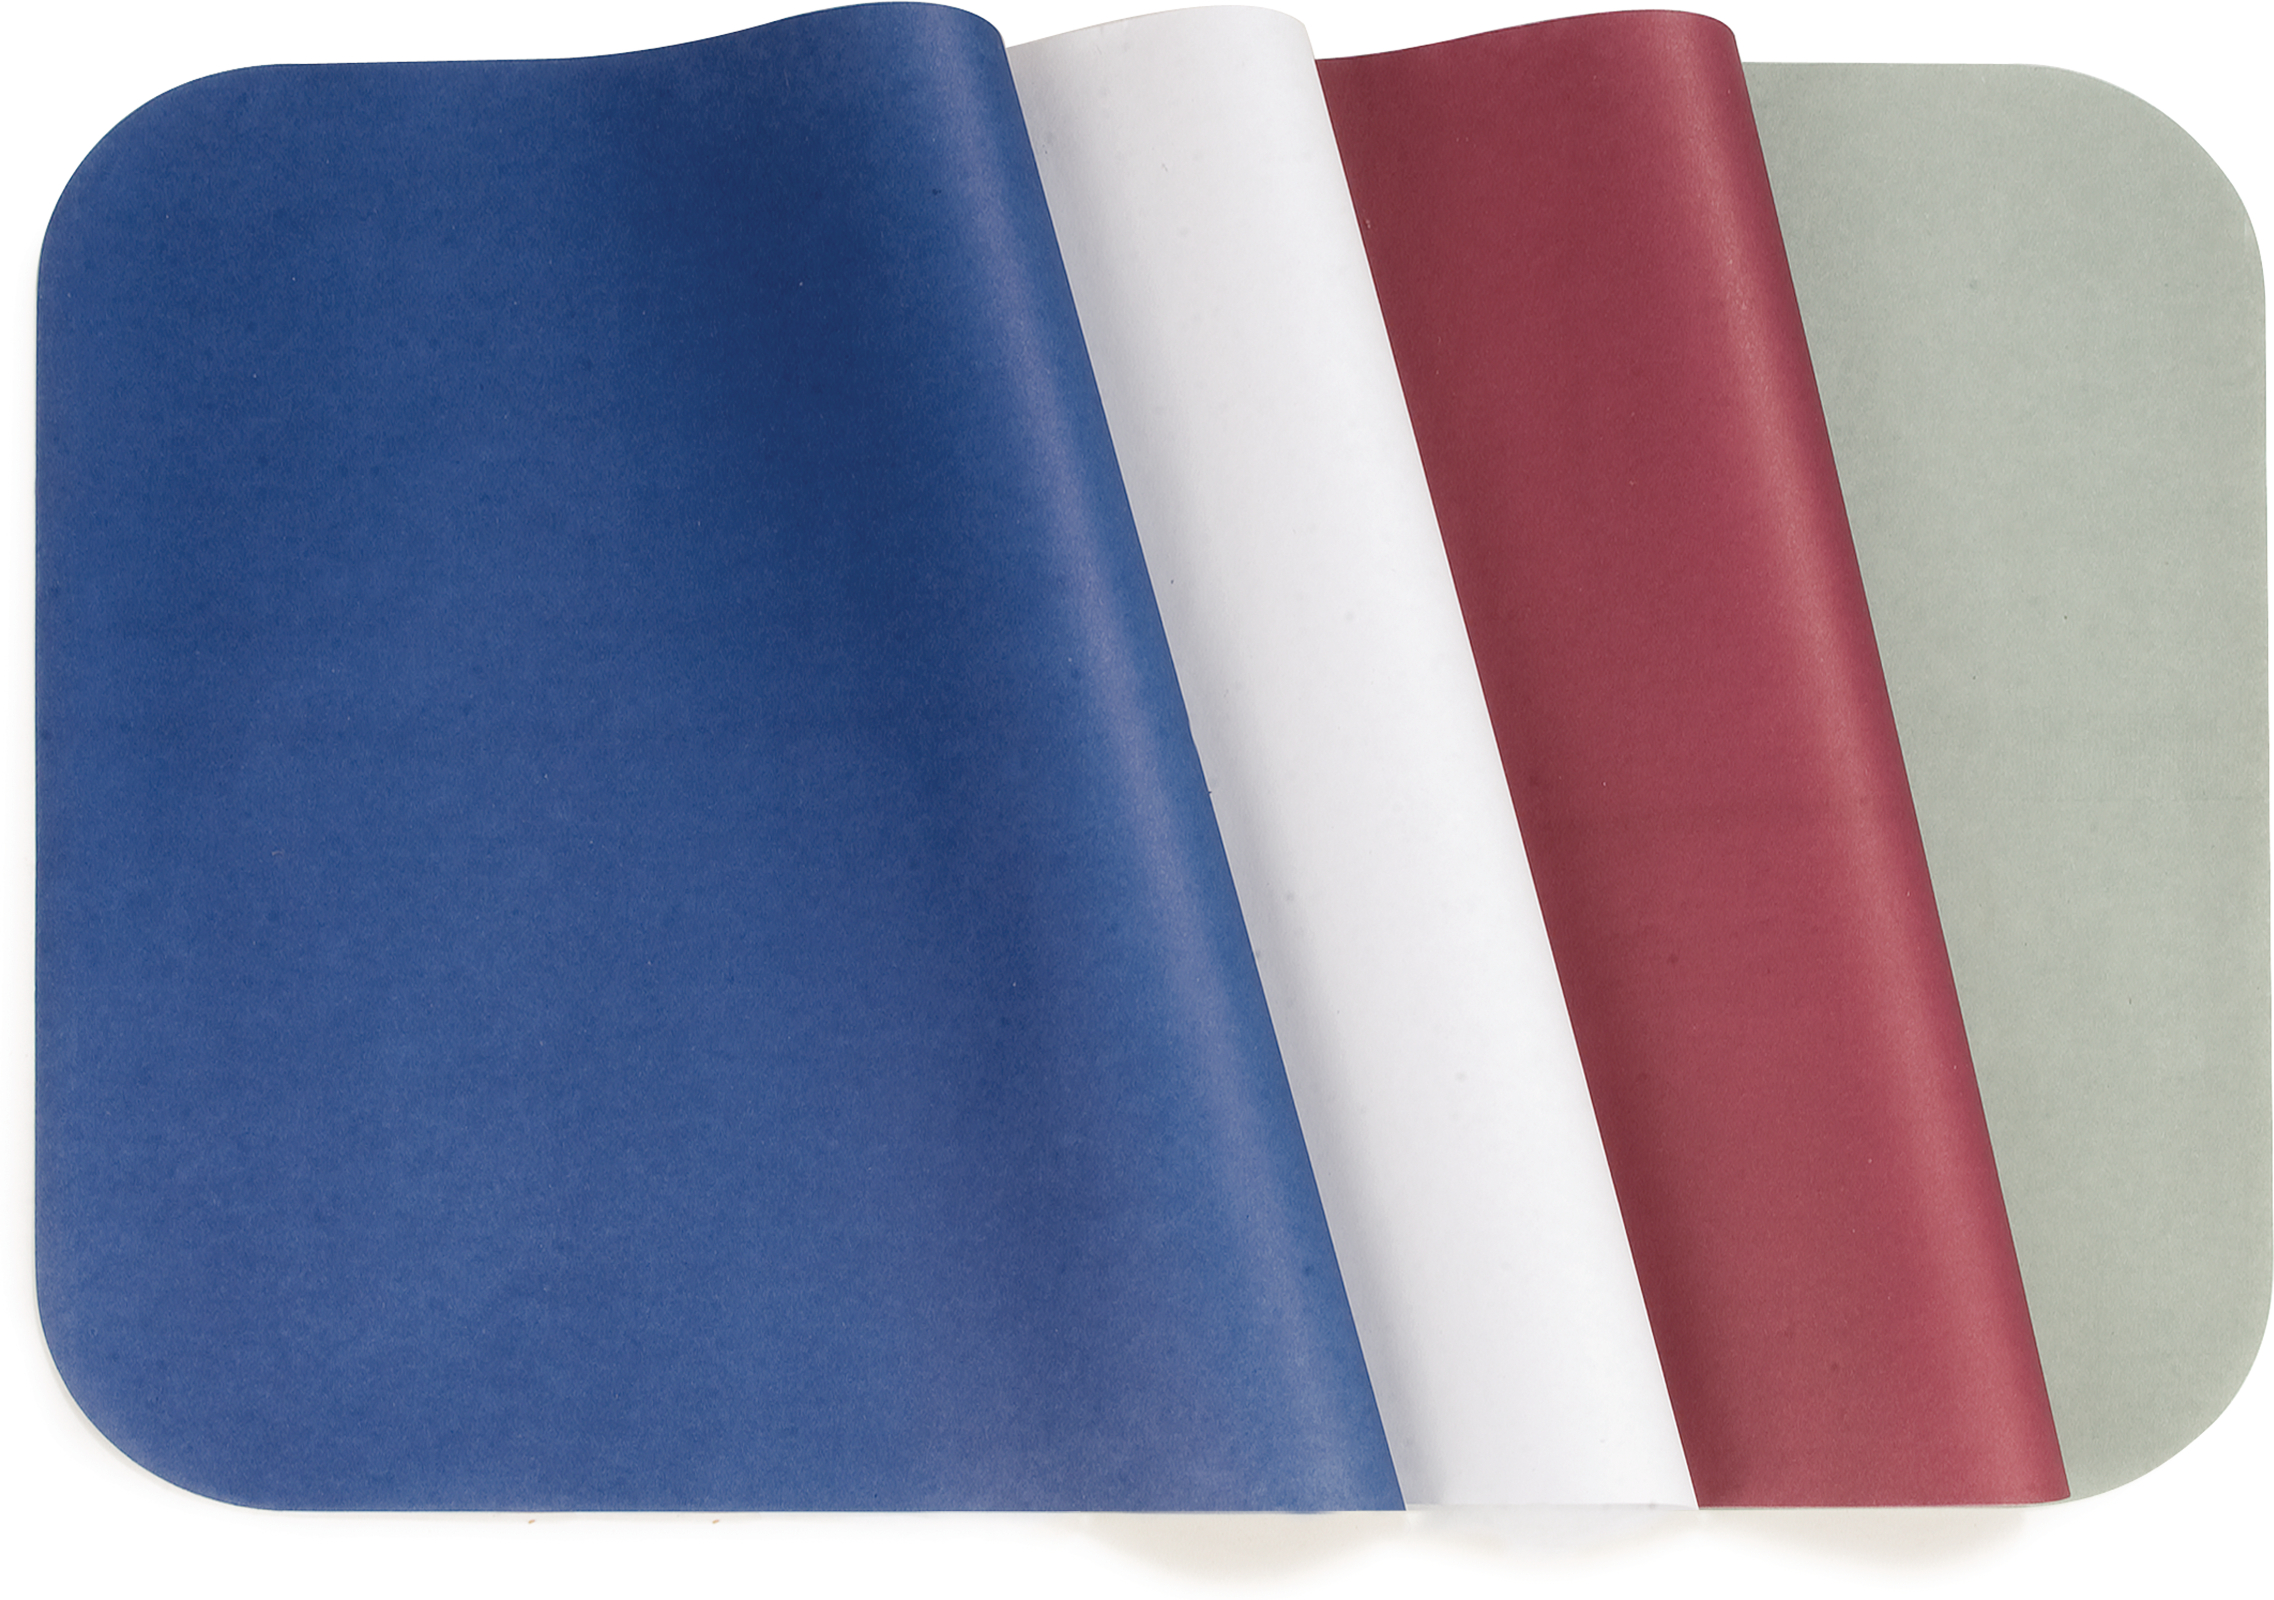 download Textile Fibre Composites in Civil Engineering